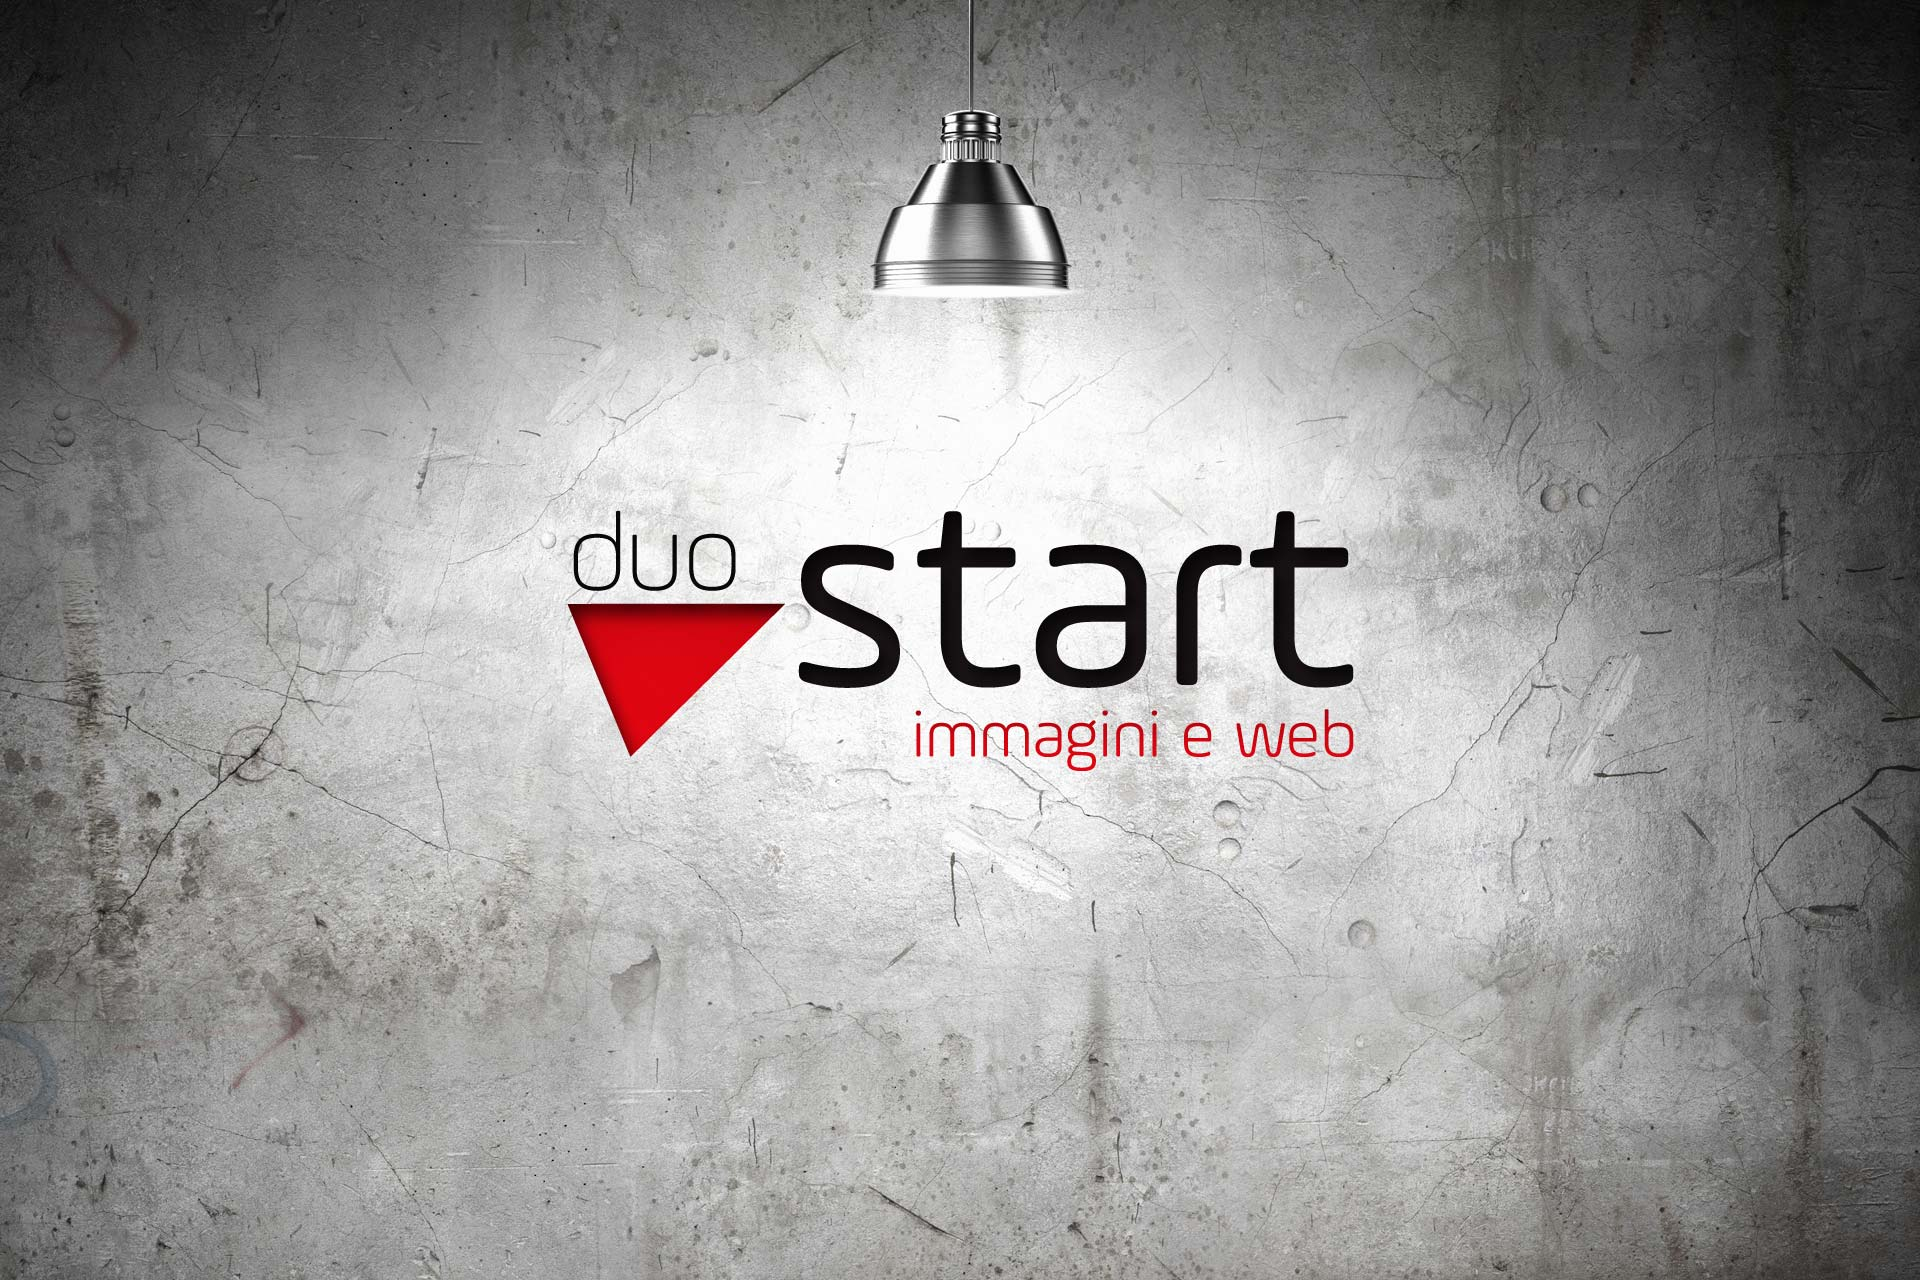 duostart-immagini-e-web-background-home-marketing-advertising-communication